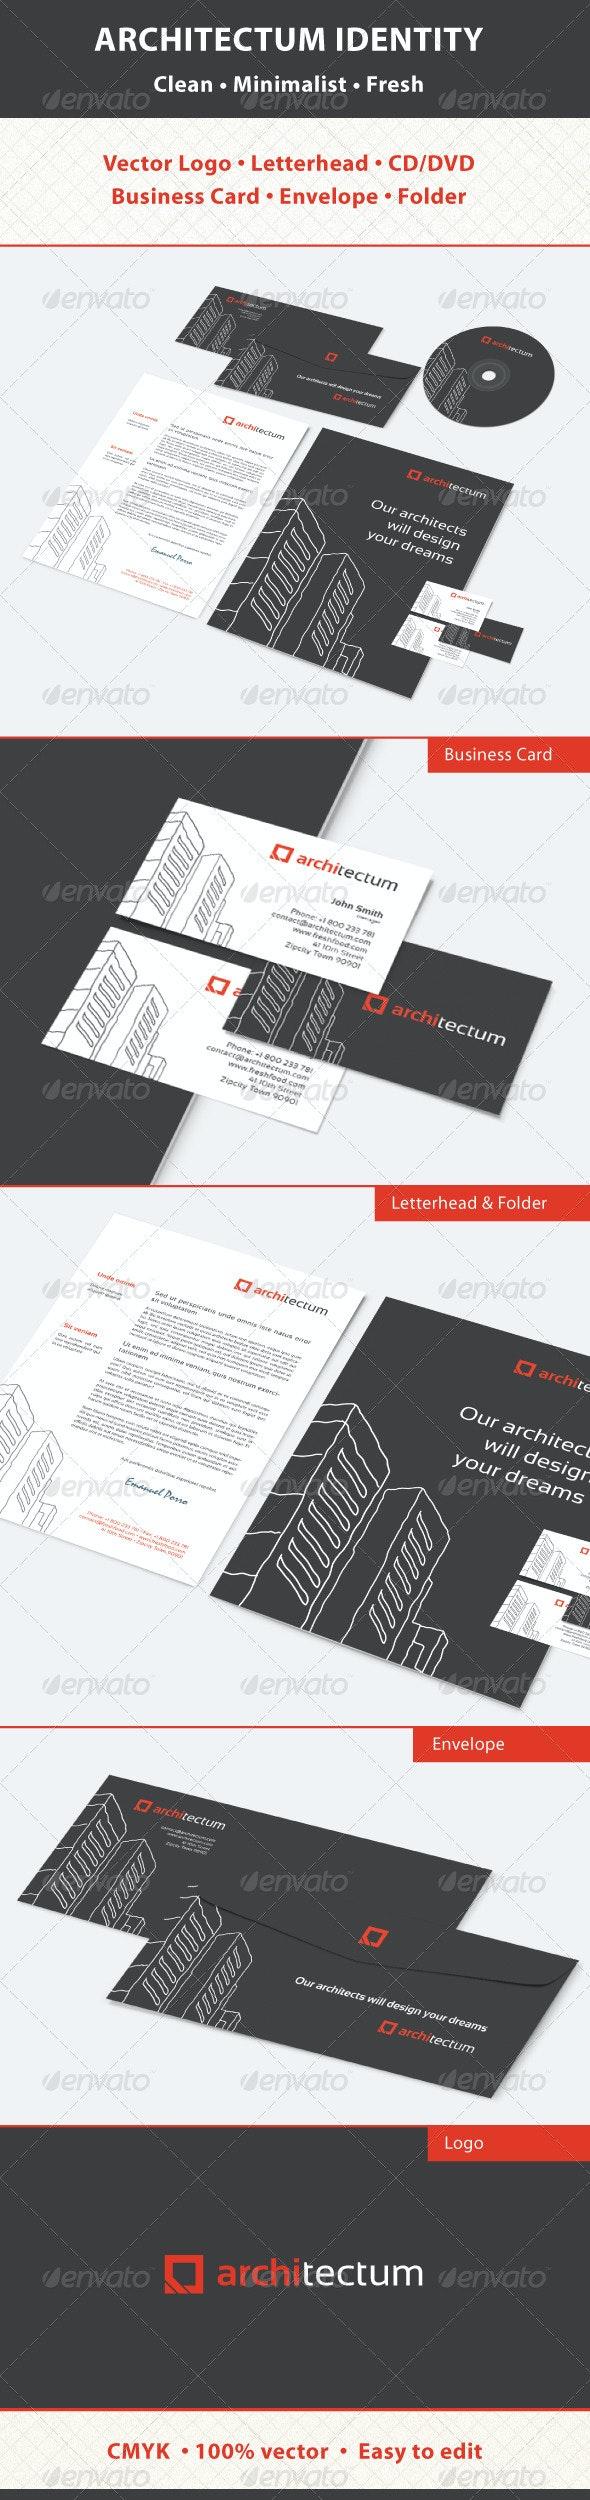 Architectum Identity - Stationery Print Templates